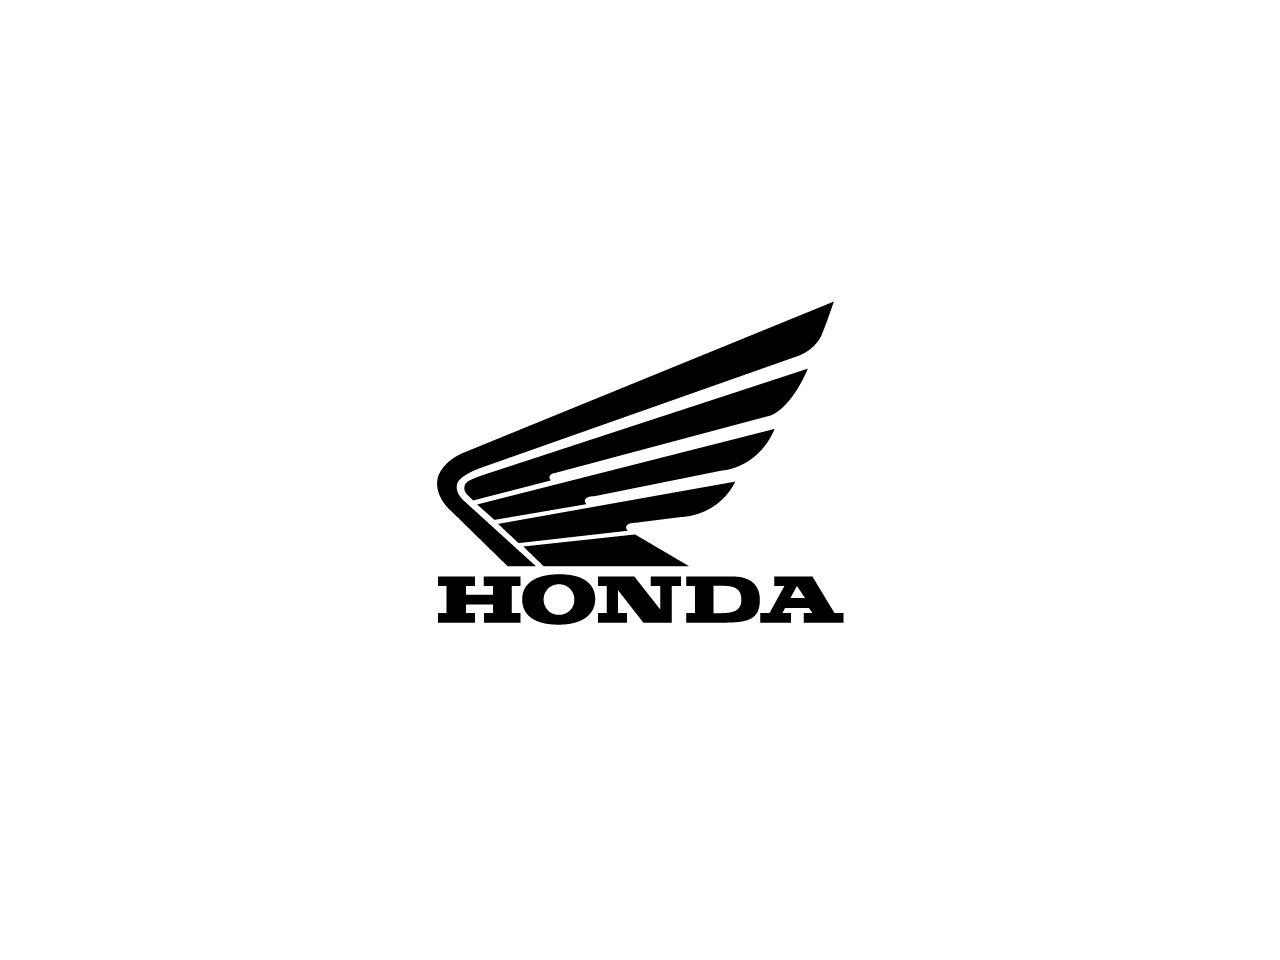 Honda Motorcycle Logo Wallpaper Widescreen 2 HD Wallpapers ...